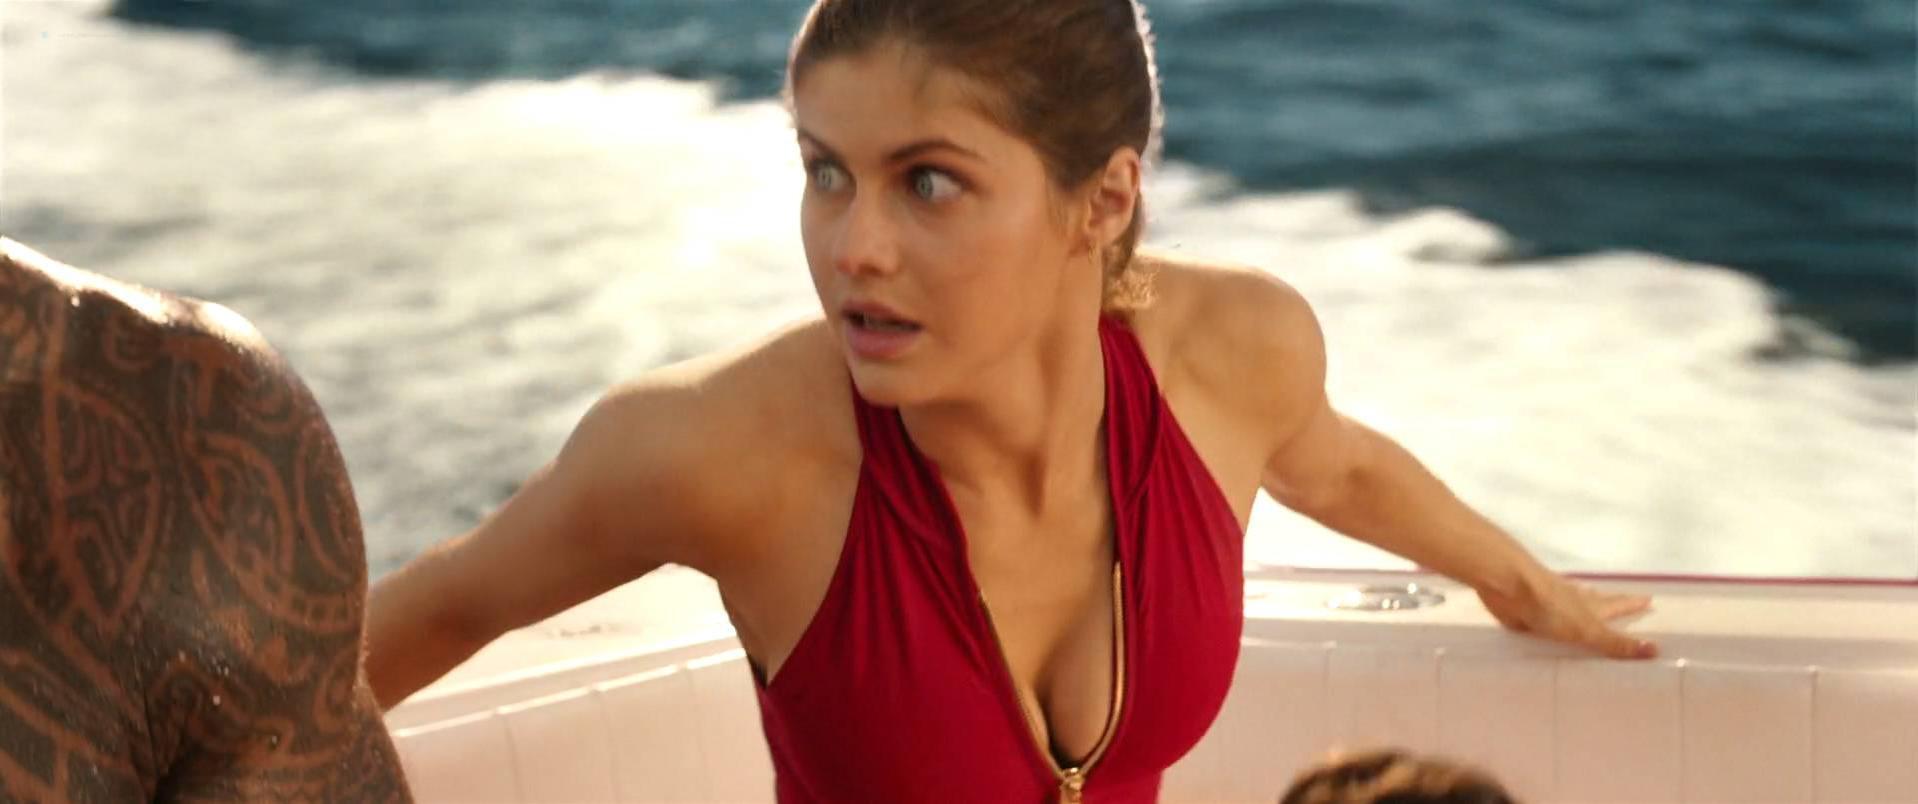 Alexandra Daddario sexy, Kelly Rohrbach sexy, Priyanka Chopra sexy - Baywatch (2017)